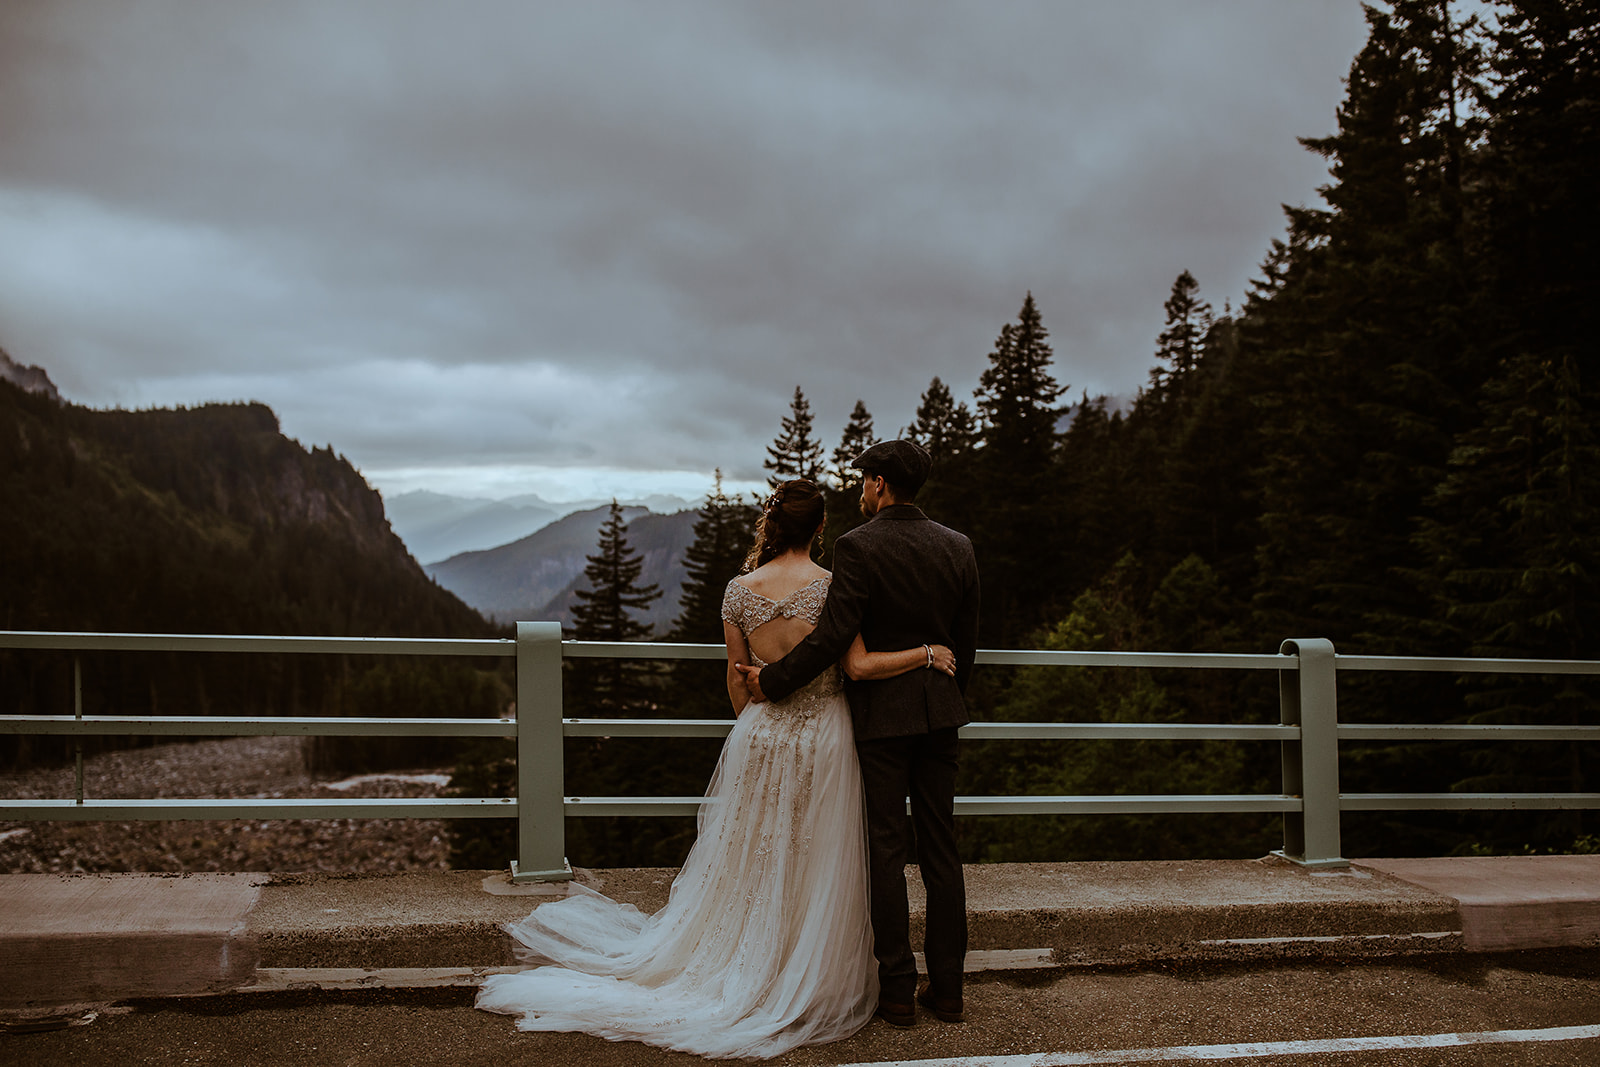 mount-rainier-cabin-elopement-megan-gallagher-photography_(466_of_568).jpg